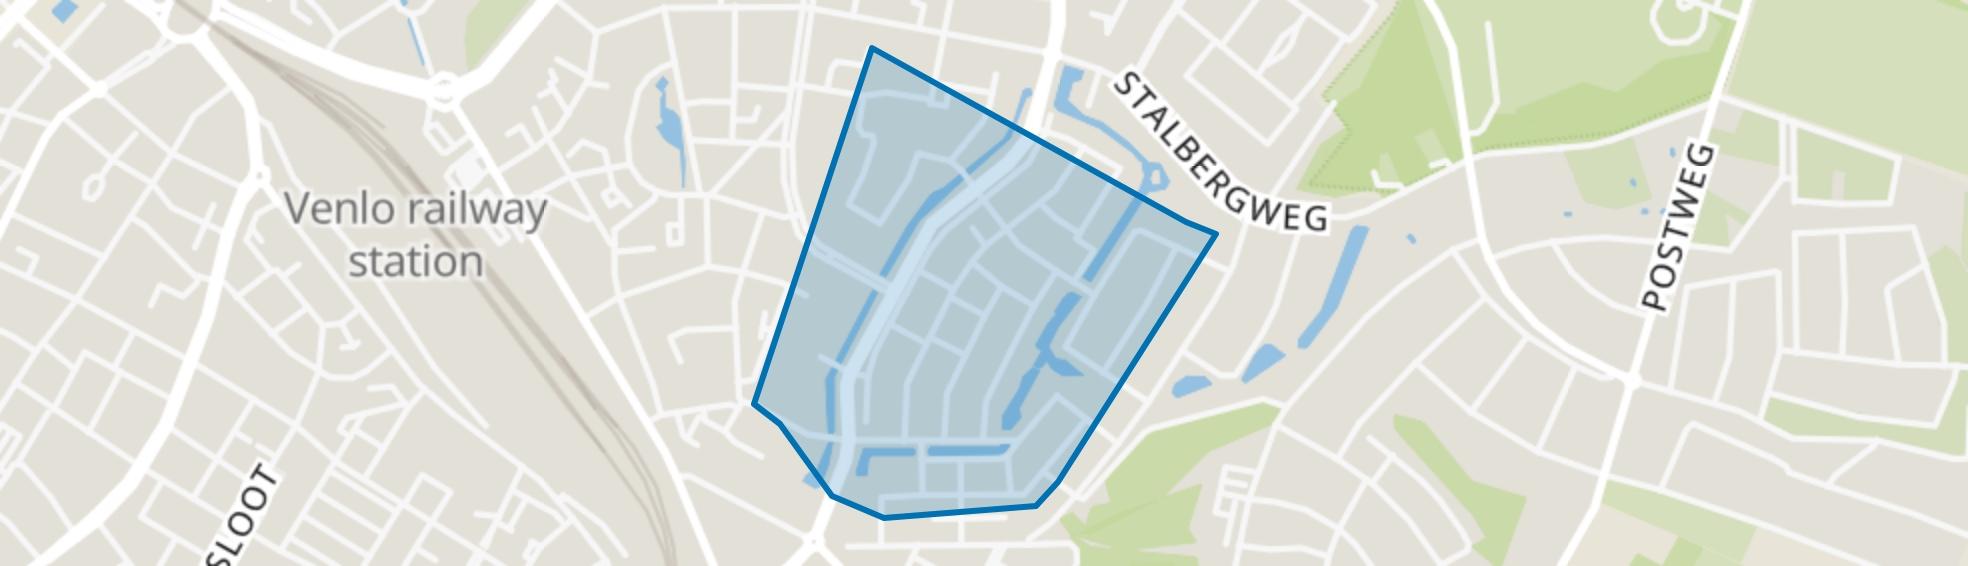 Groeneveld, Venlo map